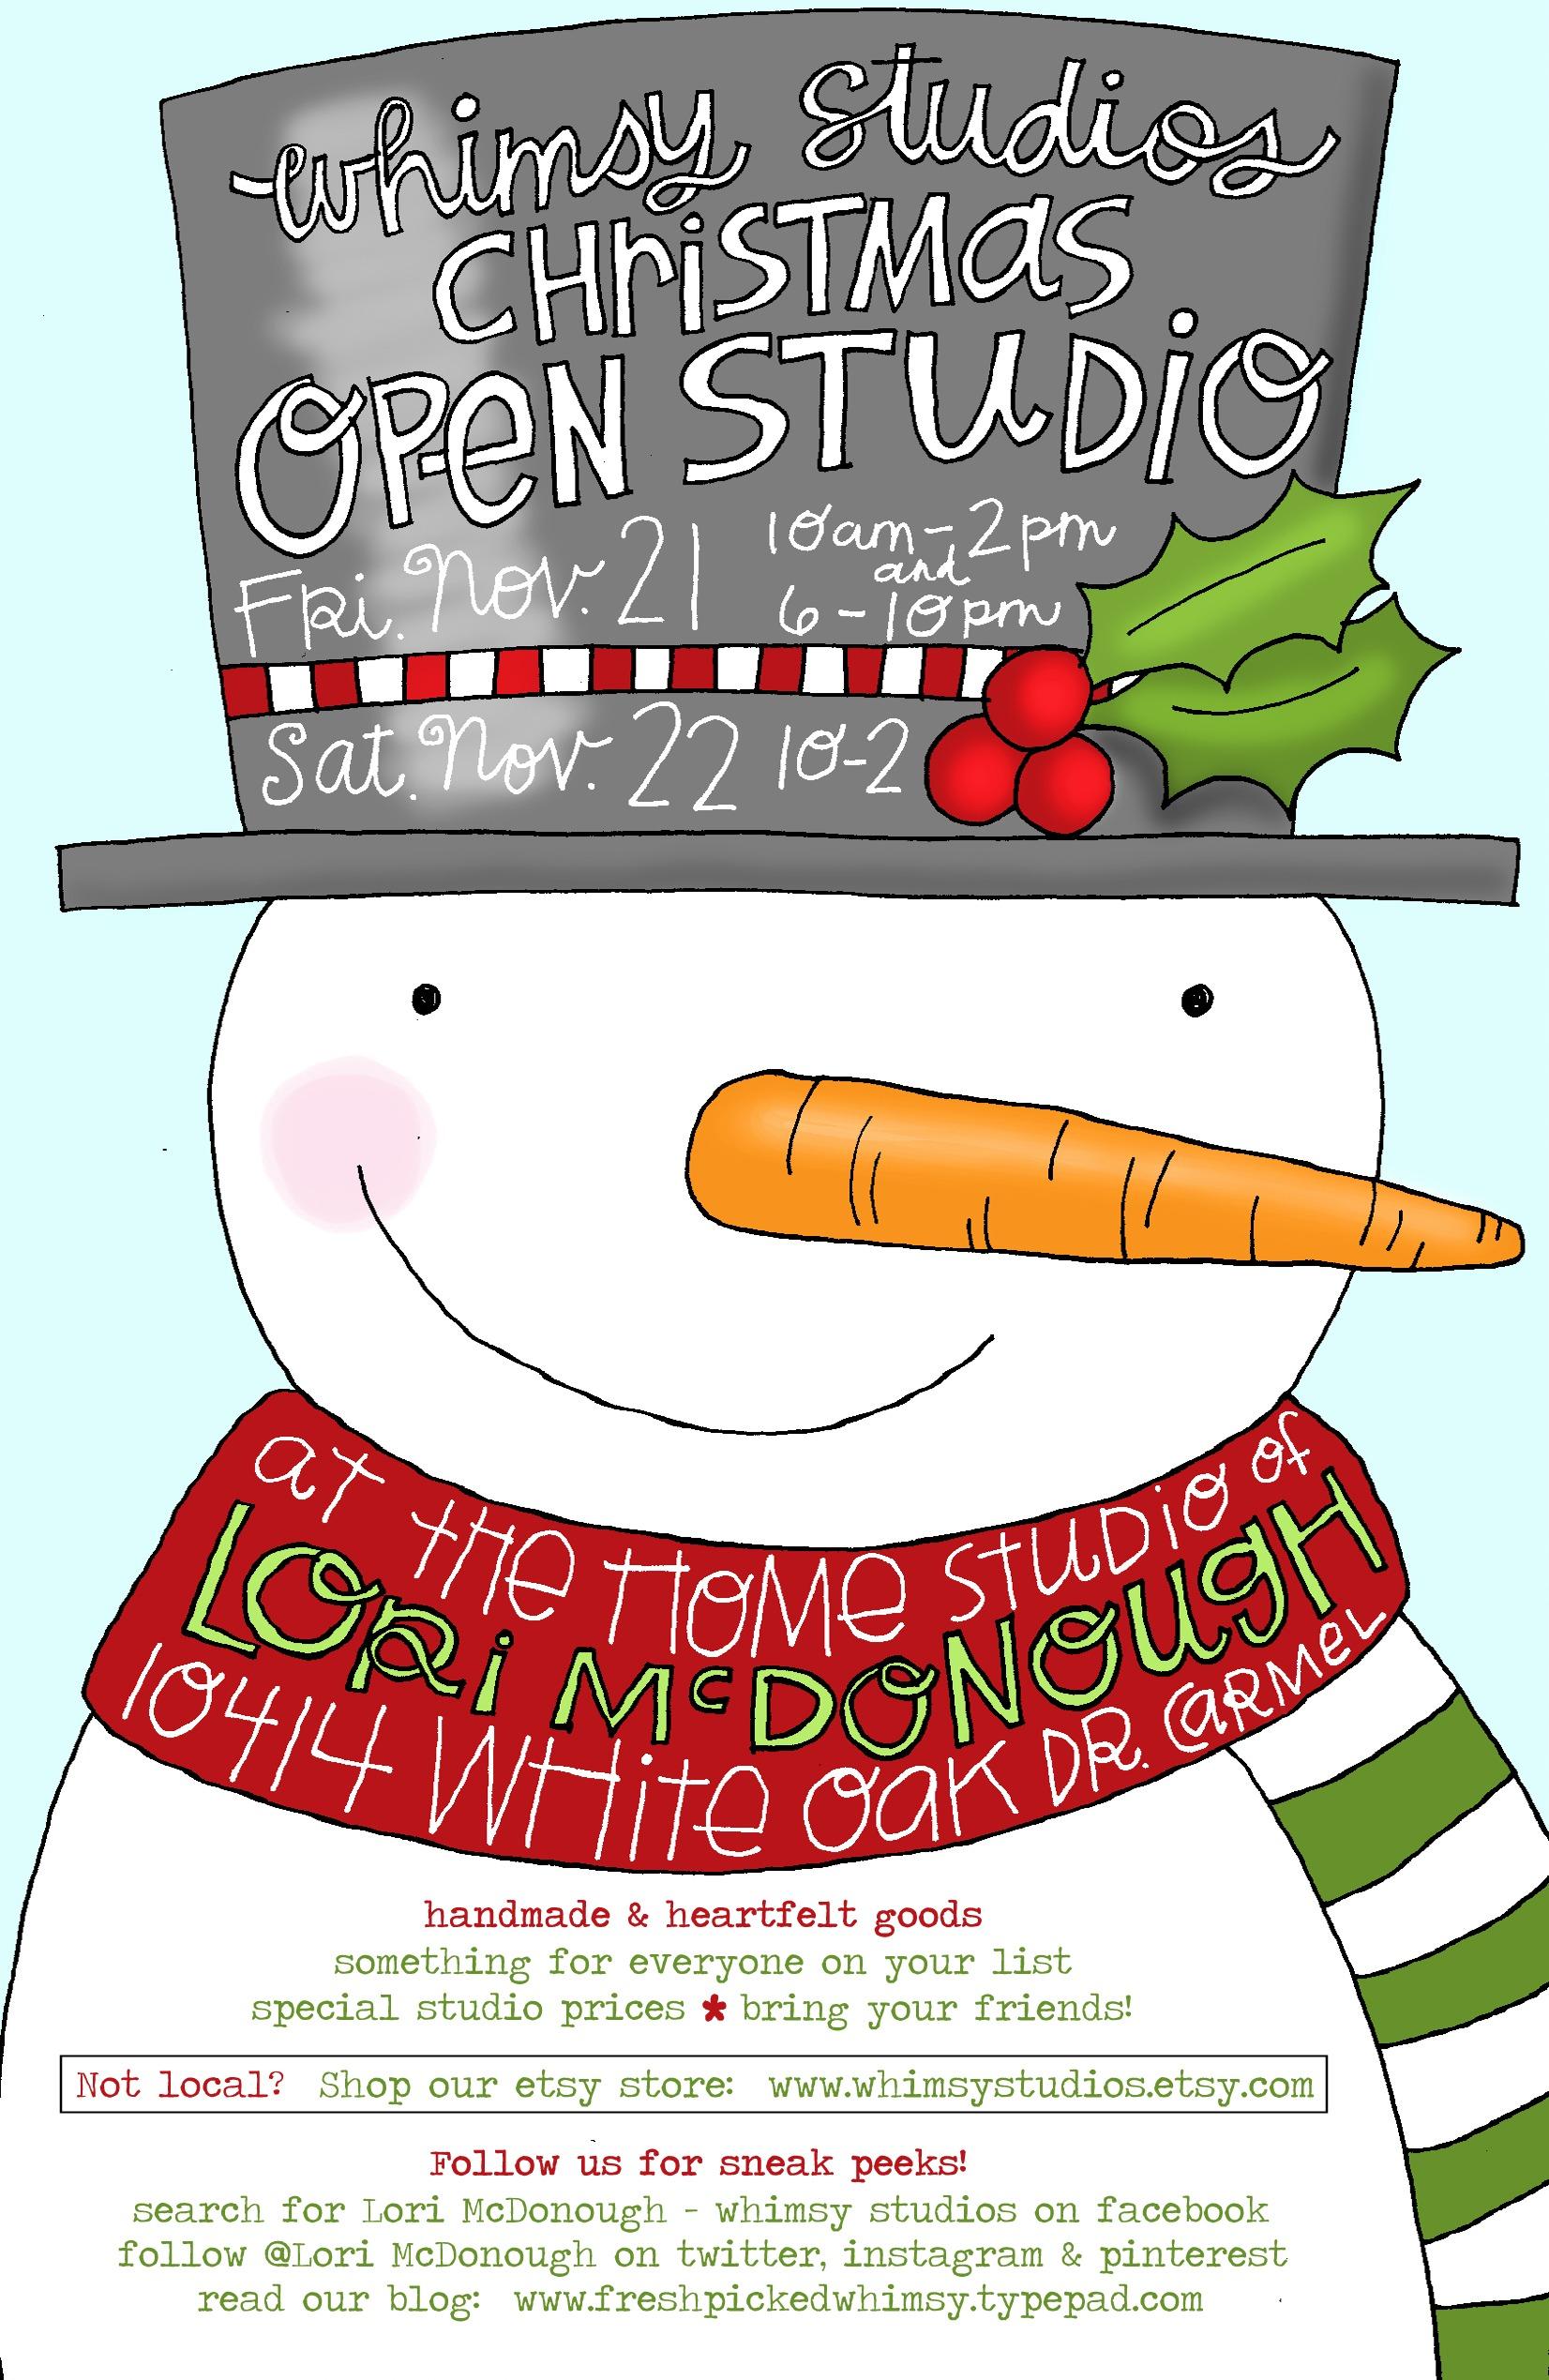 ws 2014 christmas open studio final.jpg